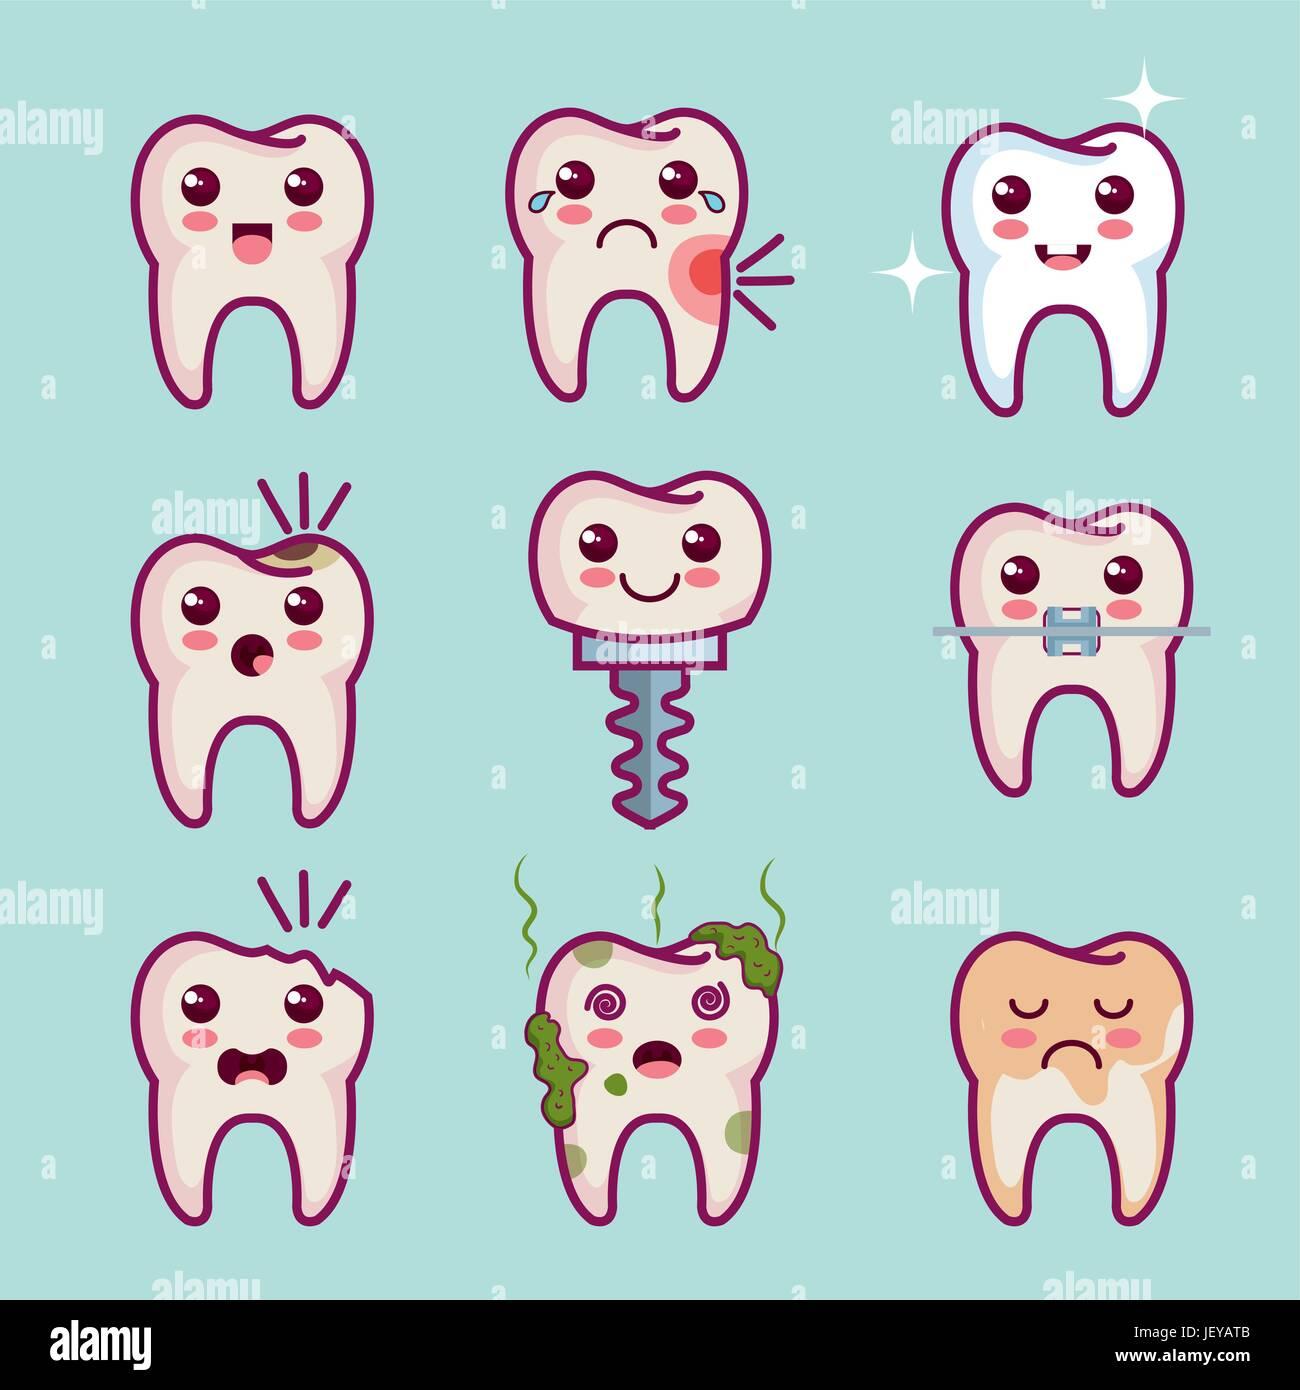 Dental health related design - Stock Image